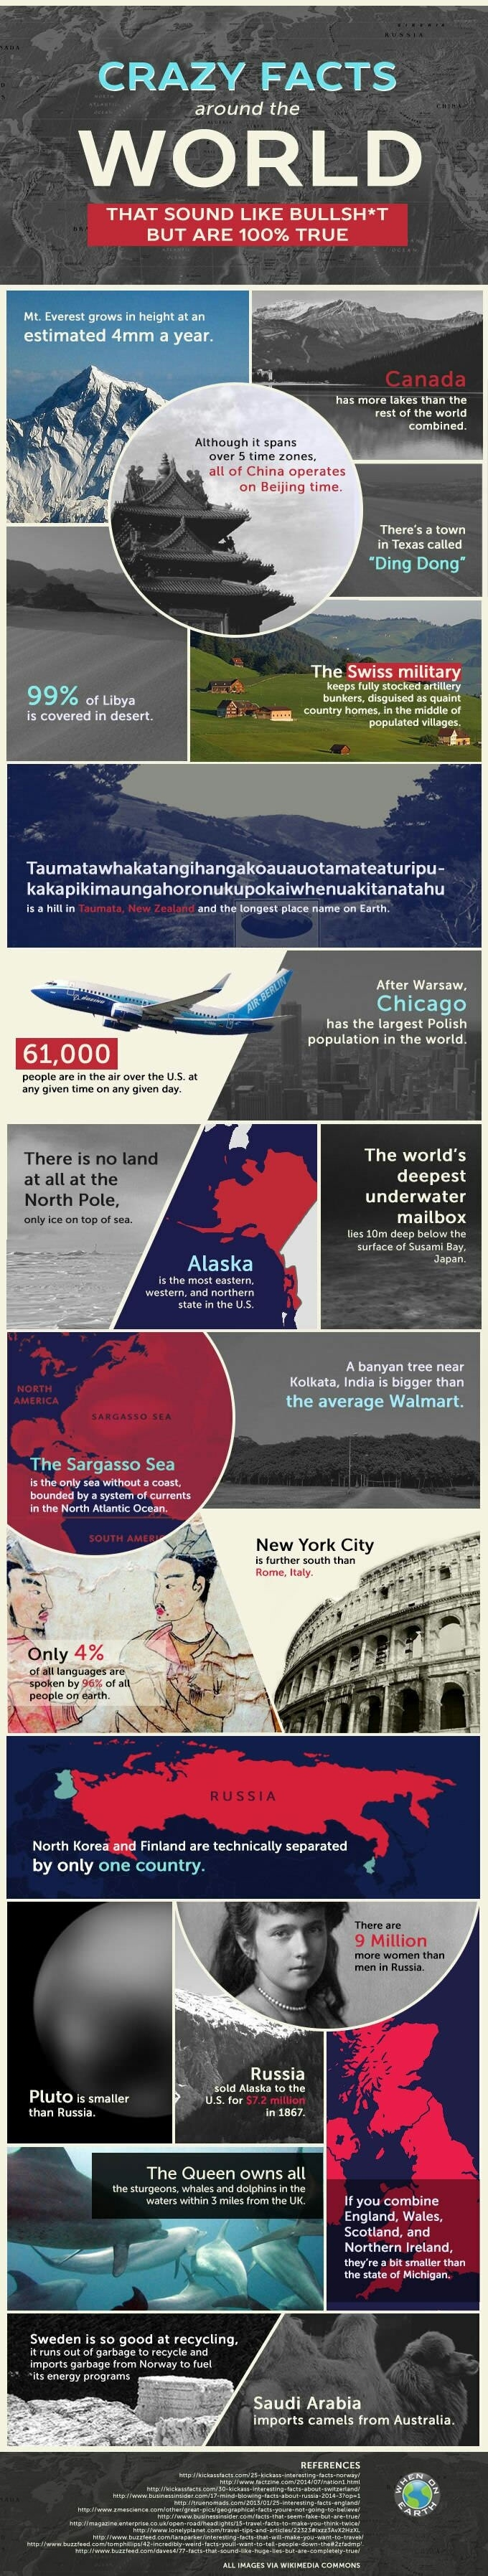 Crazy facts around the world